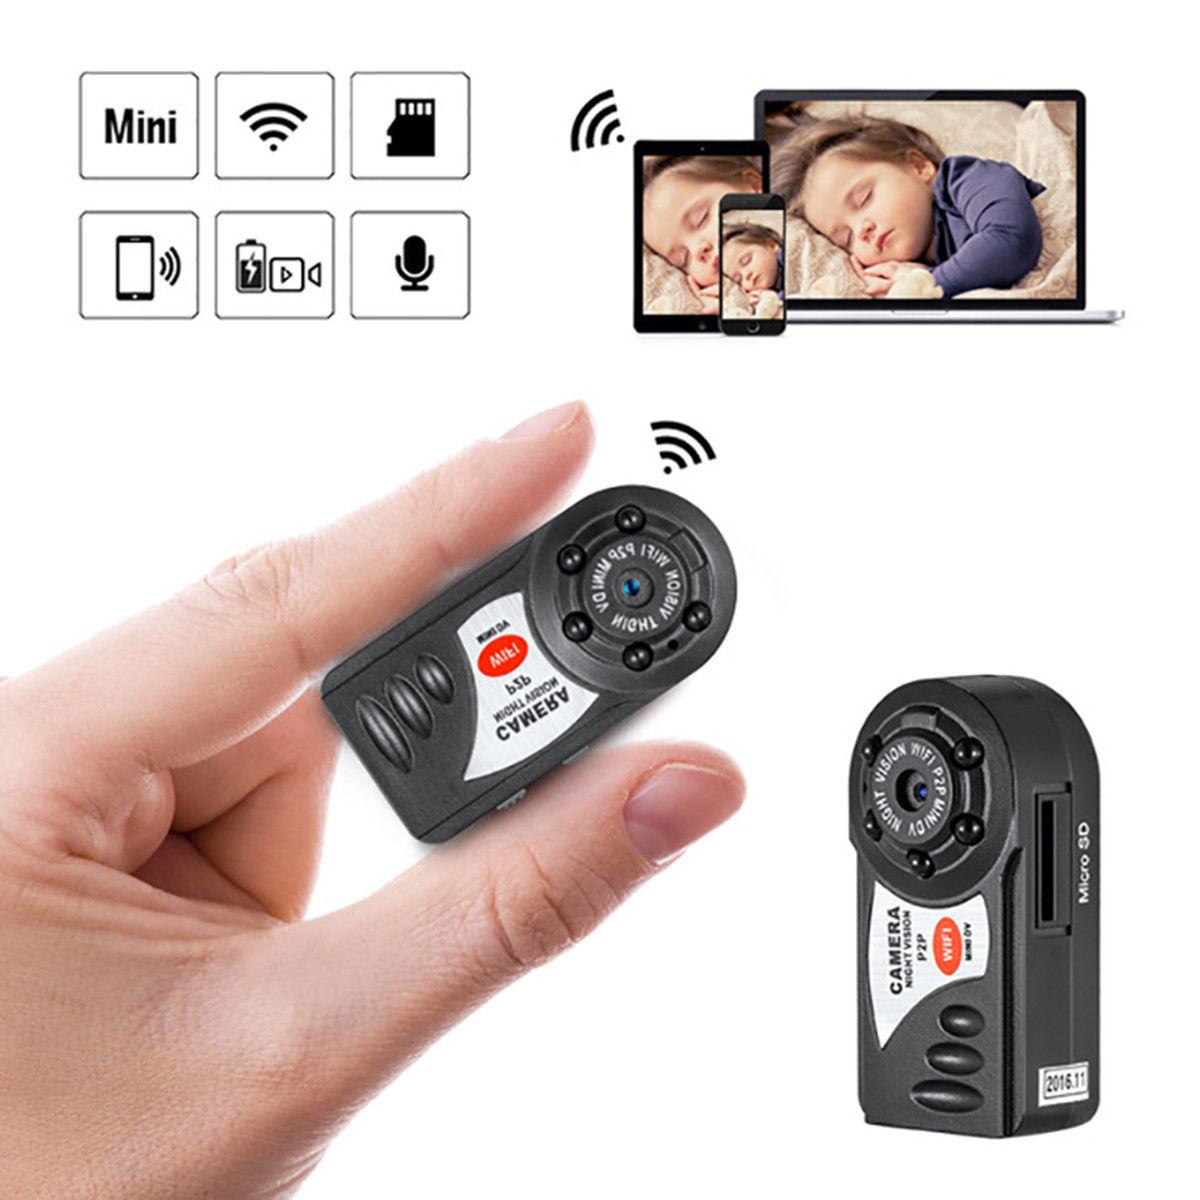 4G Card+Mini WIFI P2P Wireless Micro Camera Q7 DV Car DVR Video Recorder Camcorder4G Card+Mini WIFI P2P Wireless Micro Camera Q7 DV Car DVR Video Recorder Camcorder